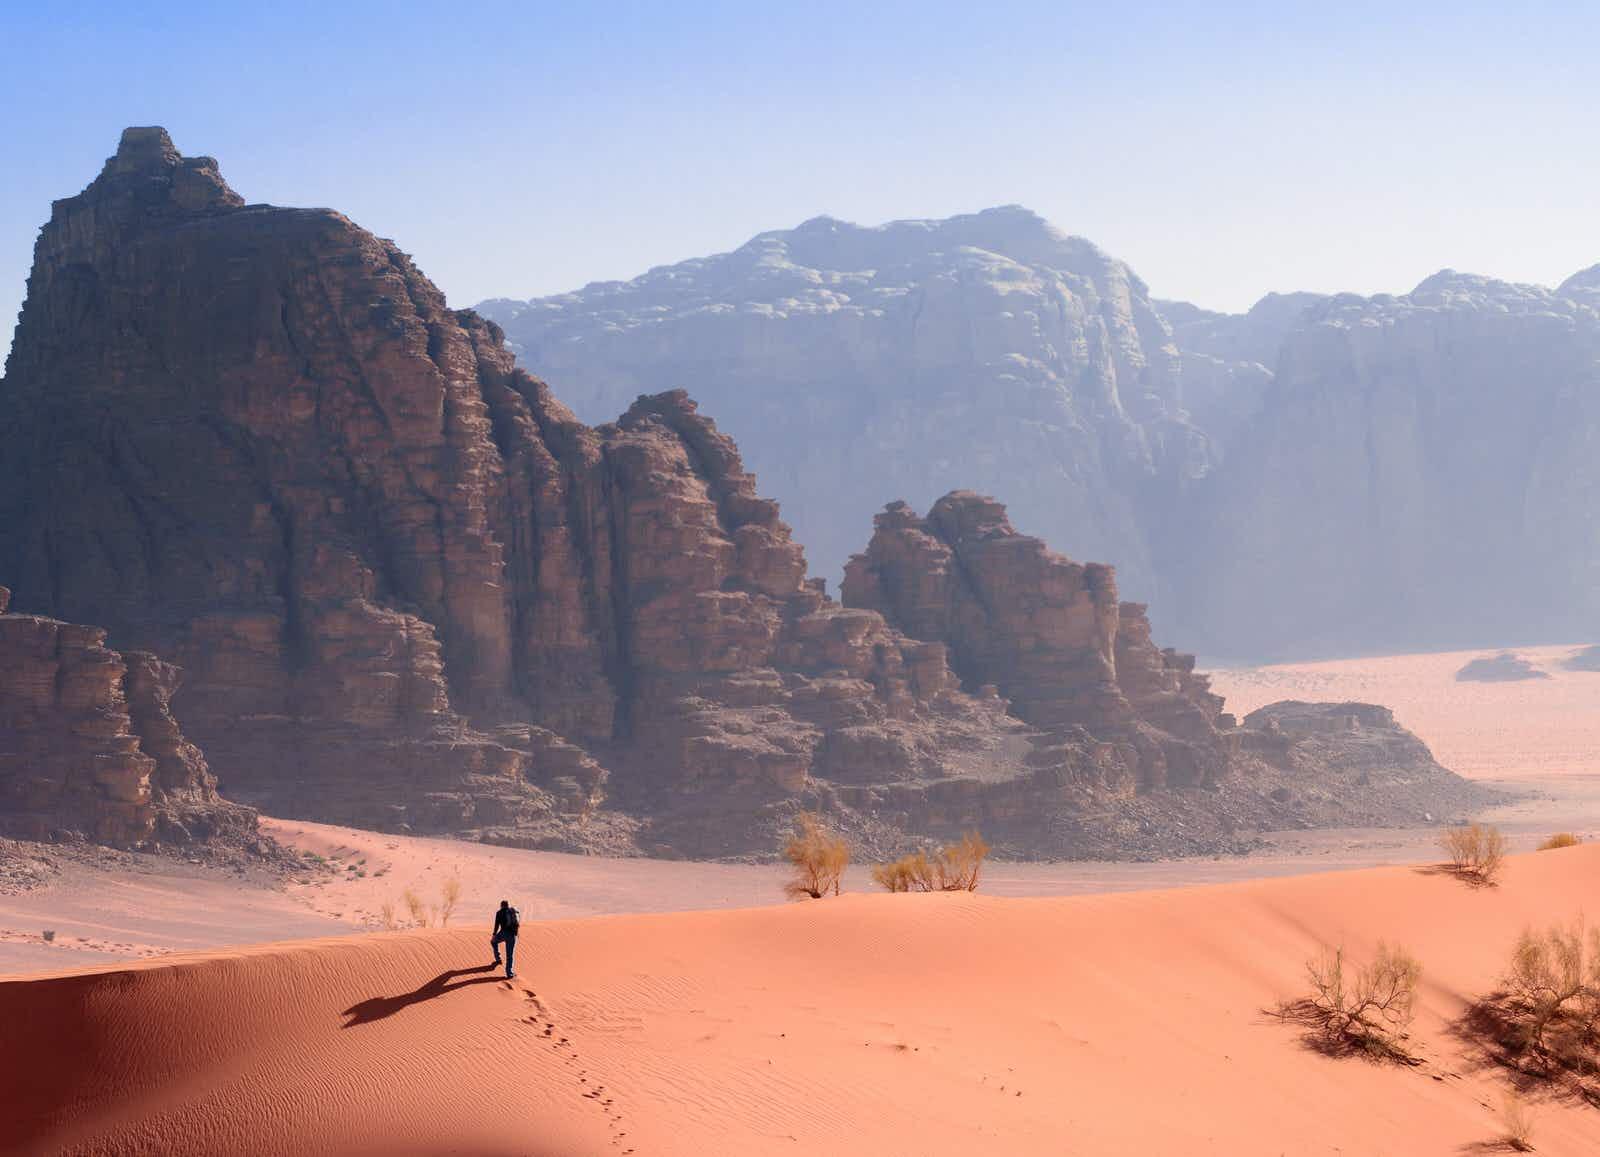 A Hiker on a Ridge in the Desert in Wadi Rum, Jordan